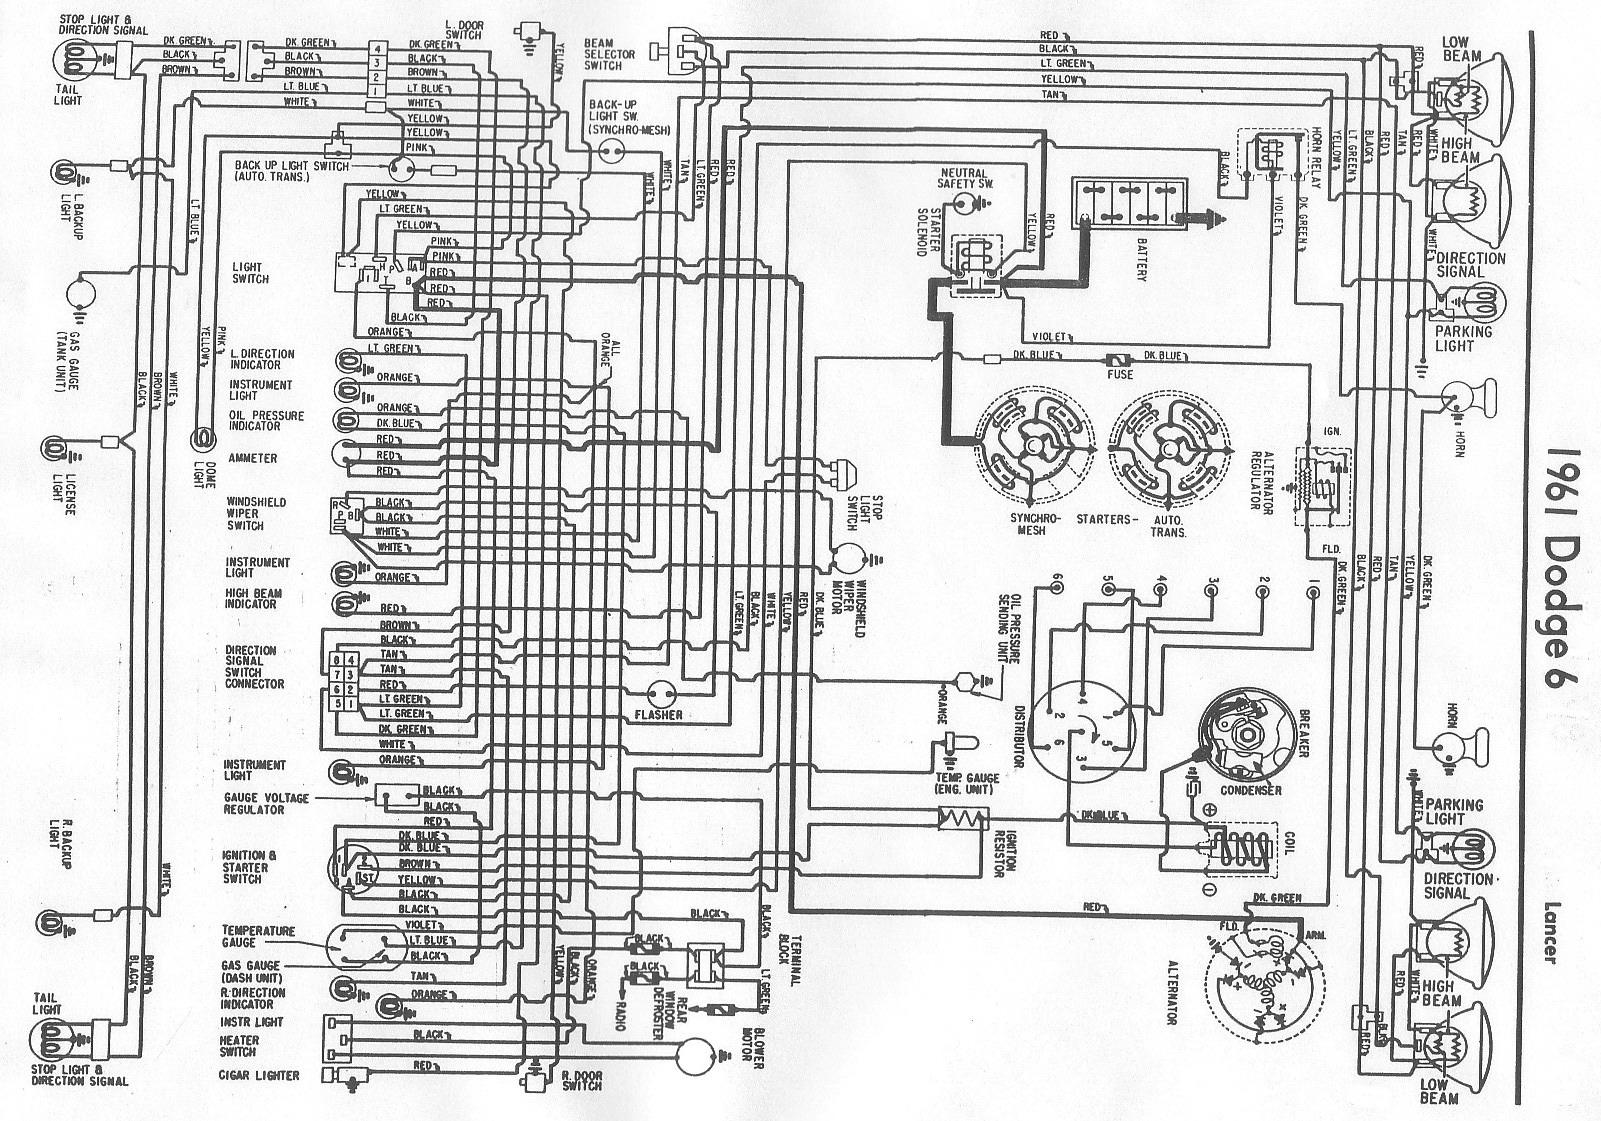 Old Fashioned Asco 940 Wiring Diagram Motif - Wiring Schematics and ...